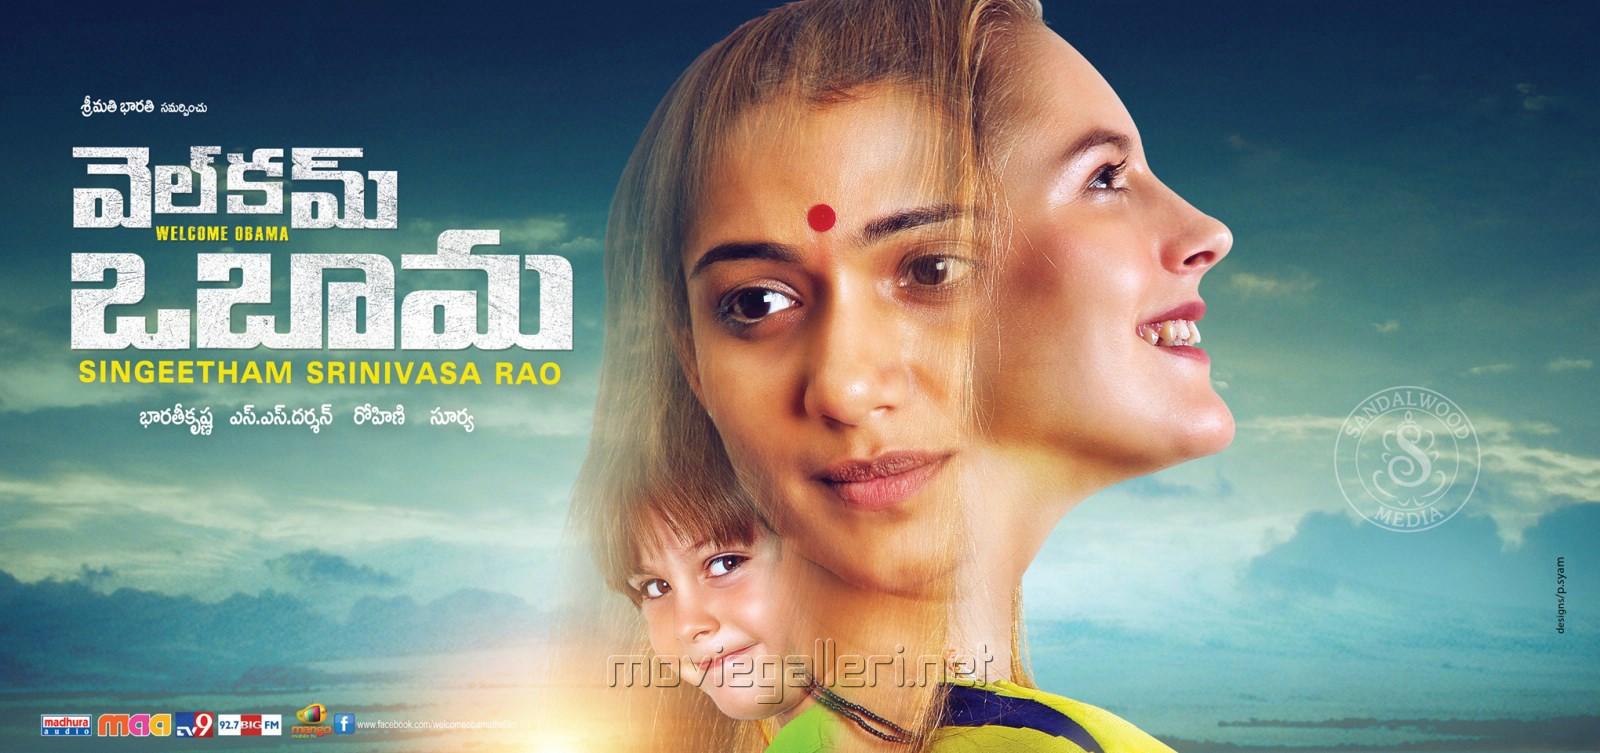 Welcome Obama Telugu Movie Wallpapers